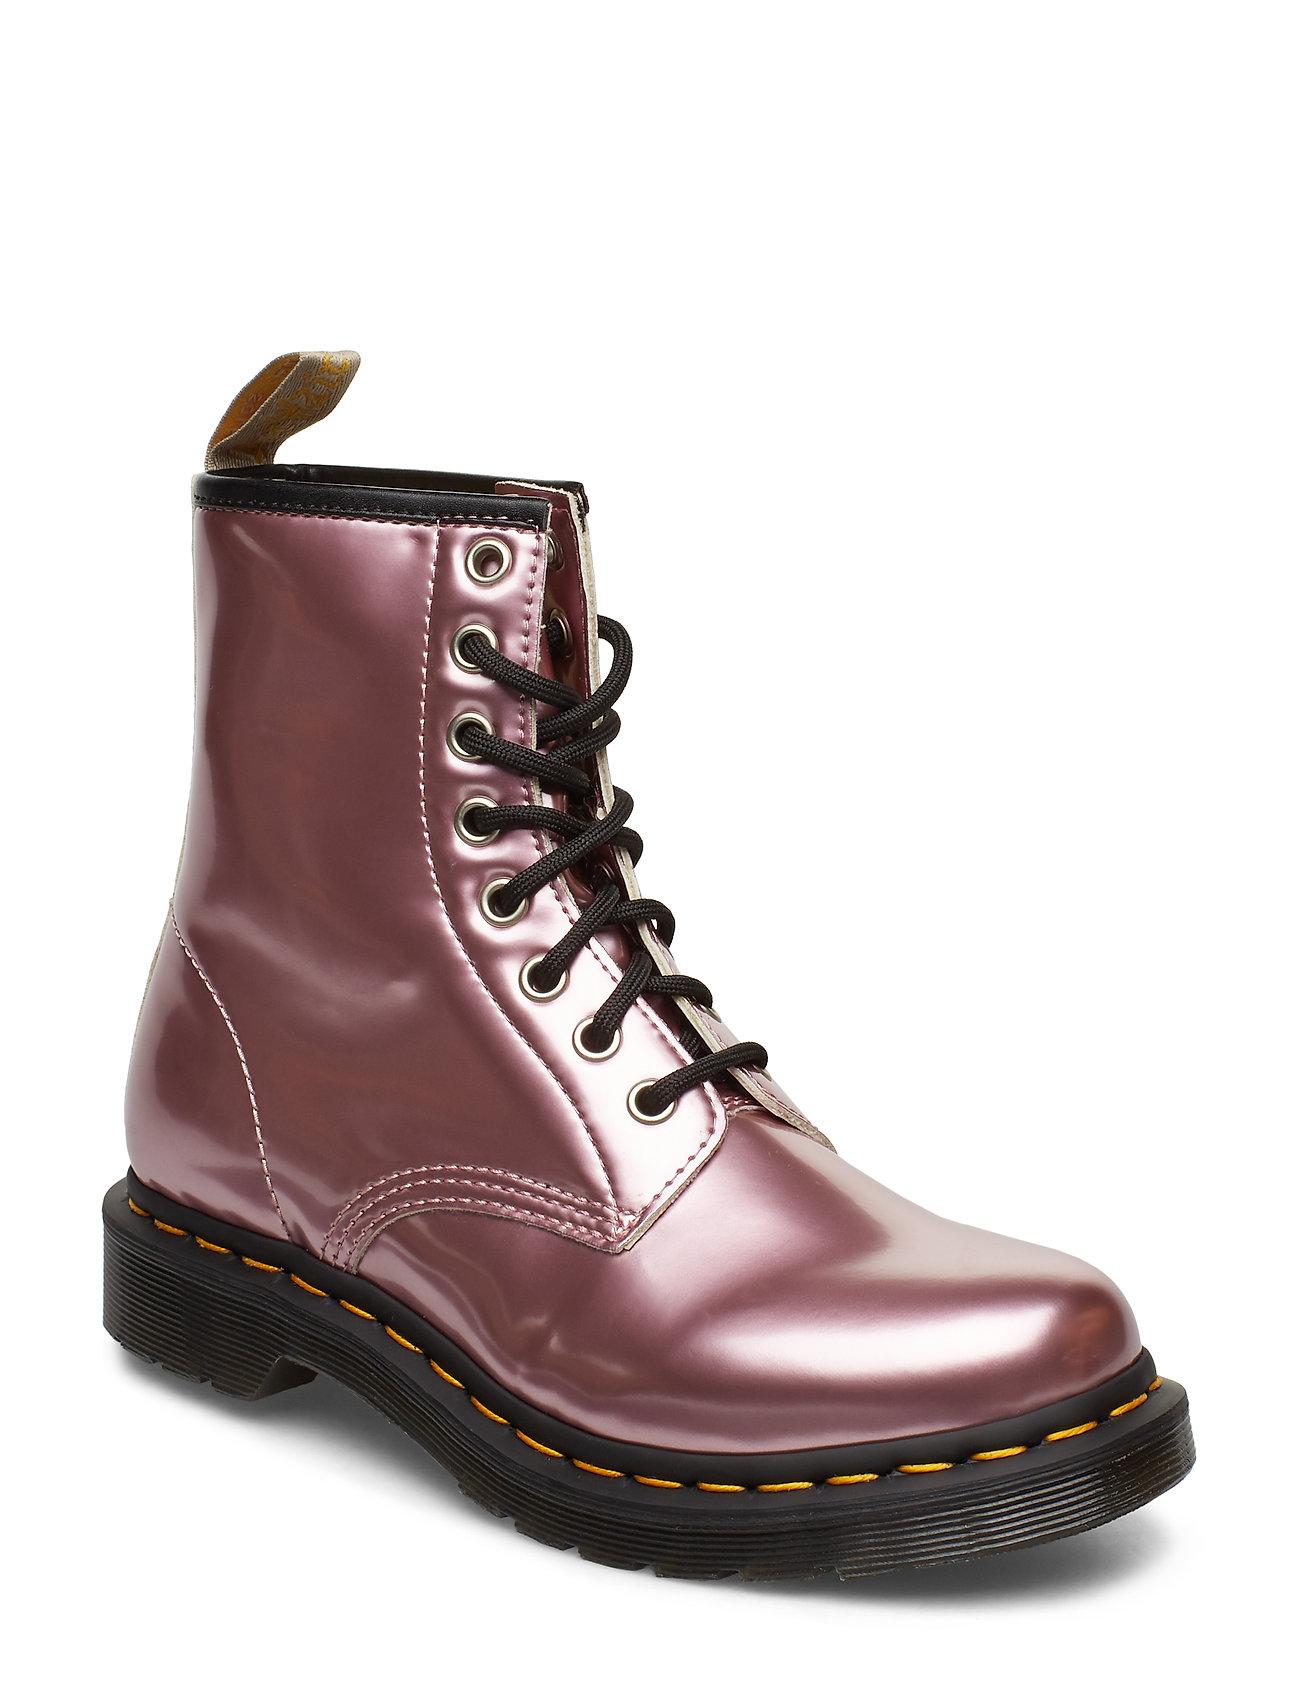 DR MARTENS 1460 Vegan Shoes Boots Ankle Boots Ankle Boots Flat Heel Lila DR. MARTENS